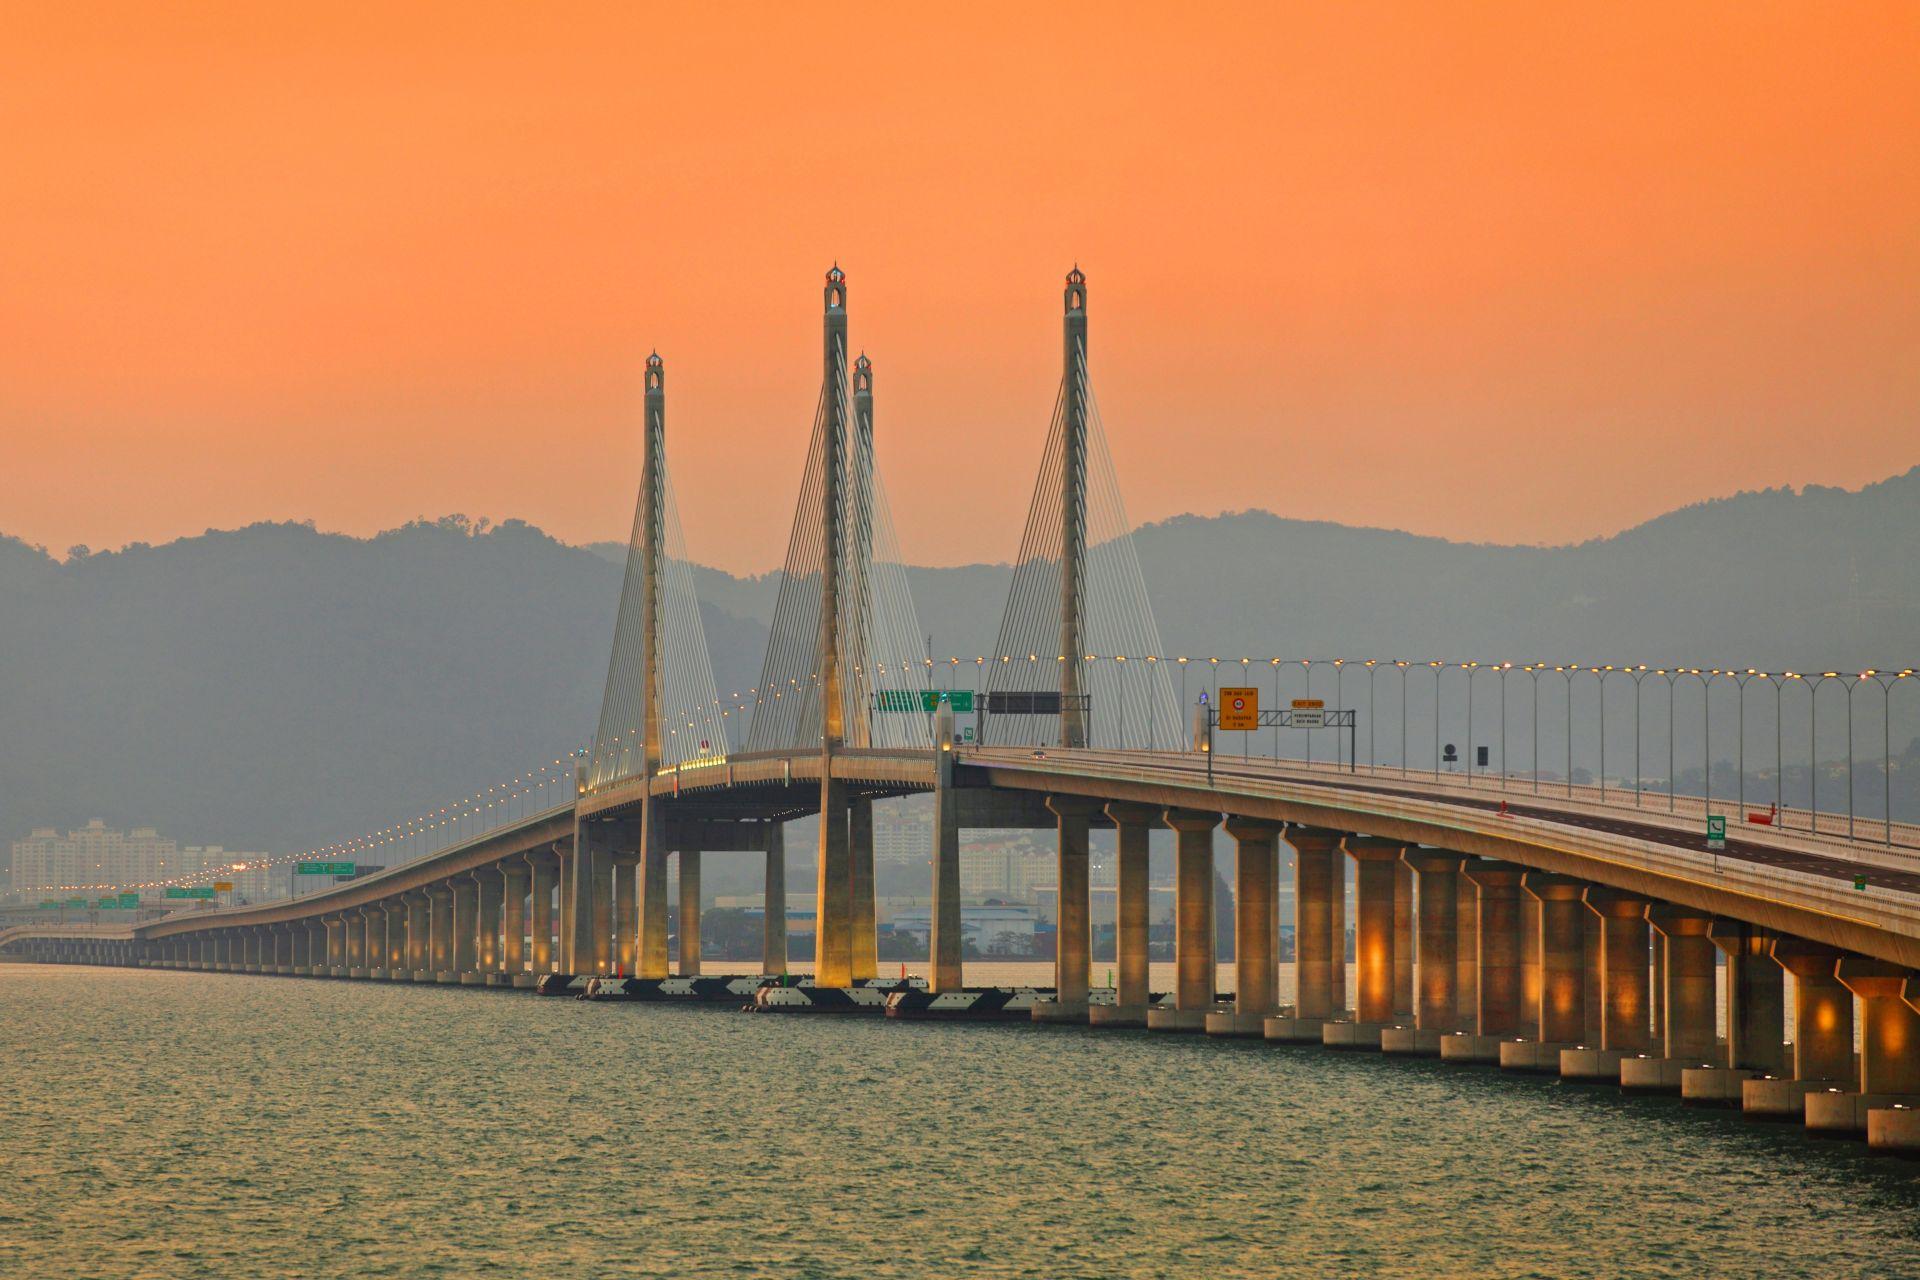 Orange sunset sky over Second Penang Bridge in Malaysia